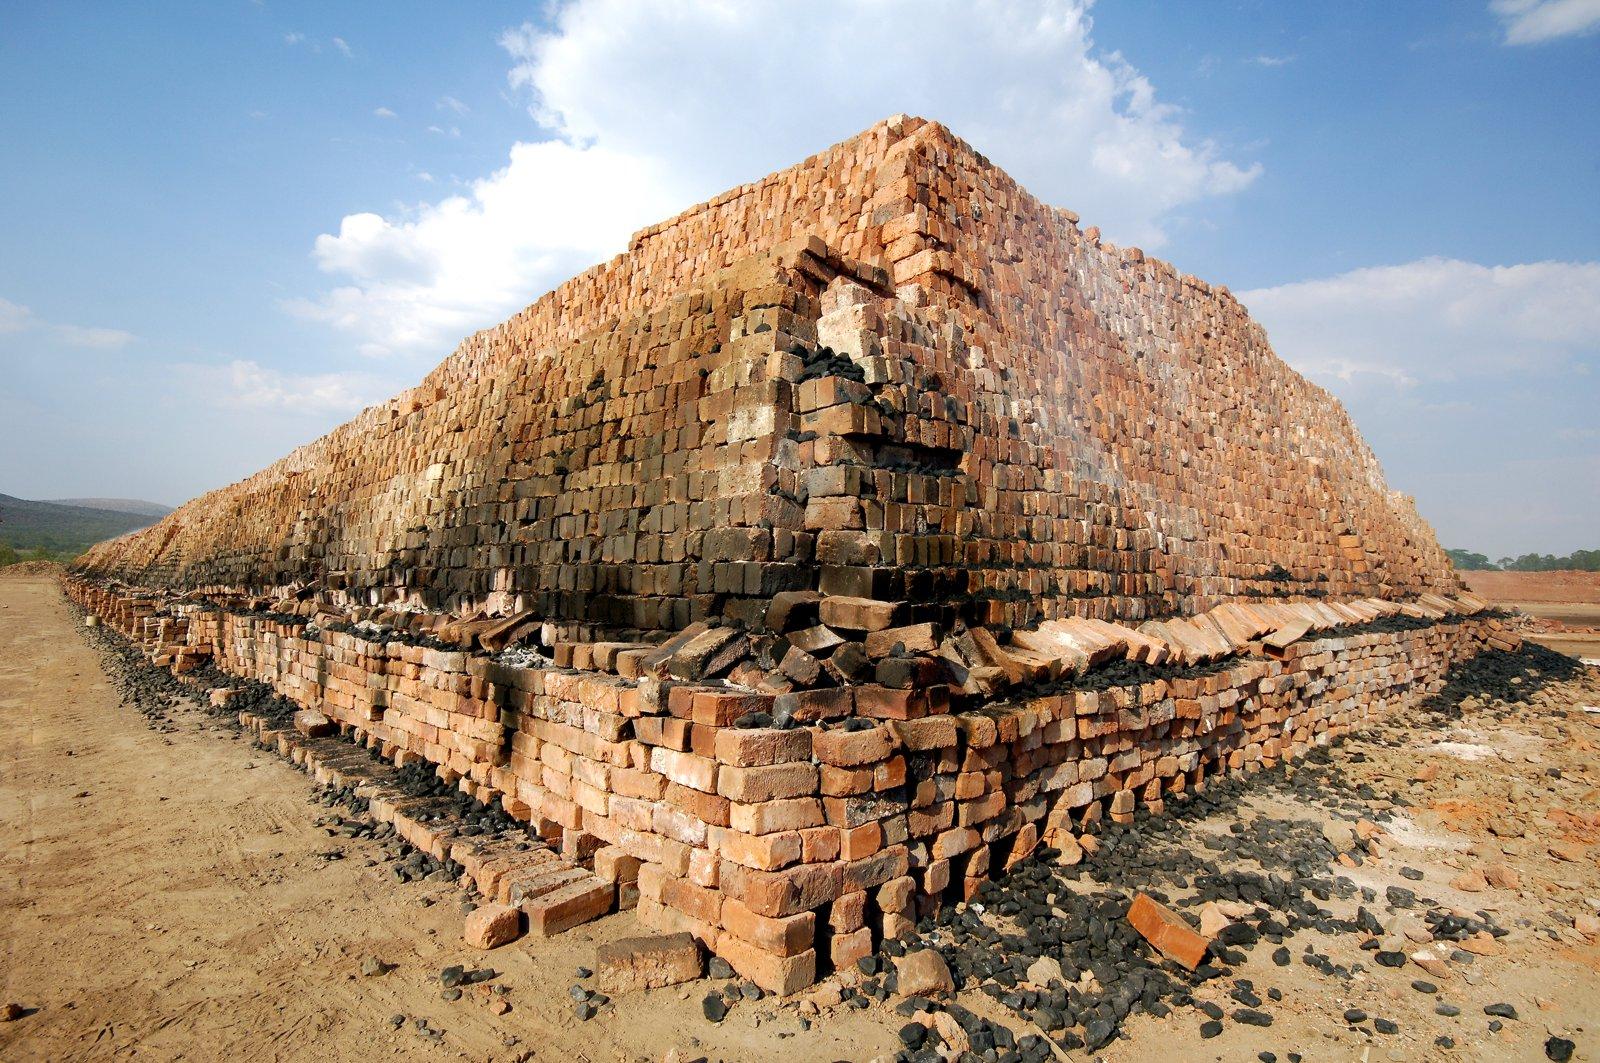 Gallery Nylstene Clay Brick Modimolle Limpopo